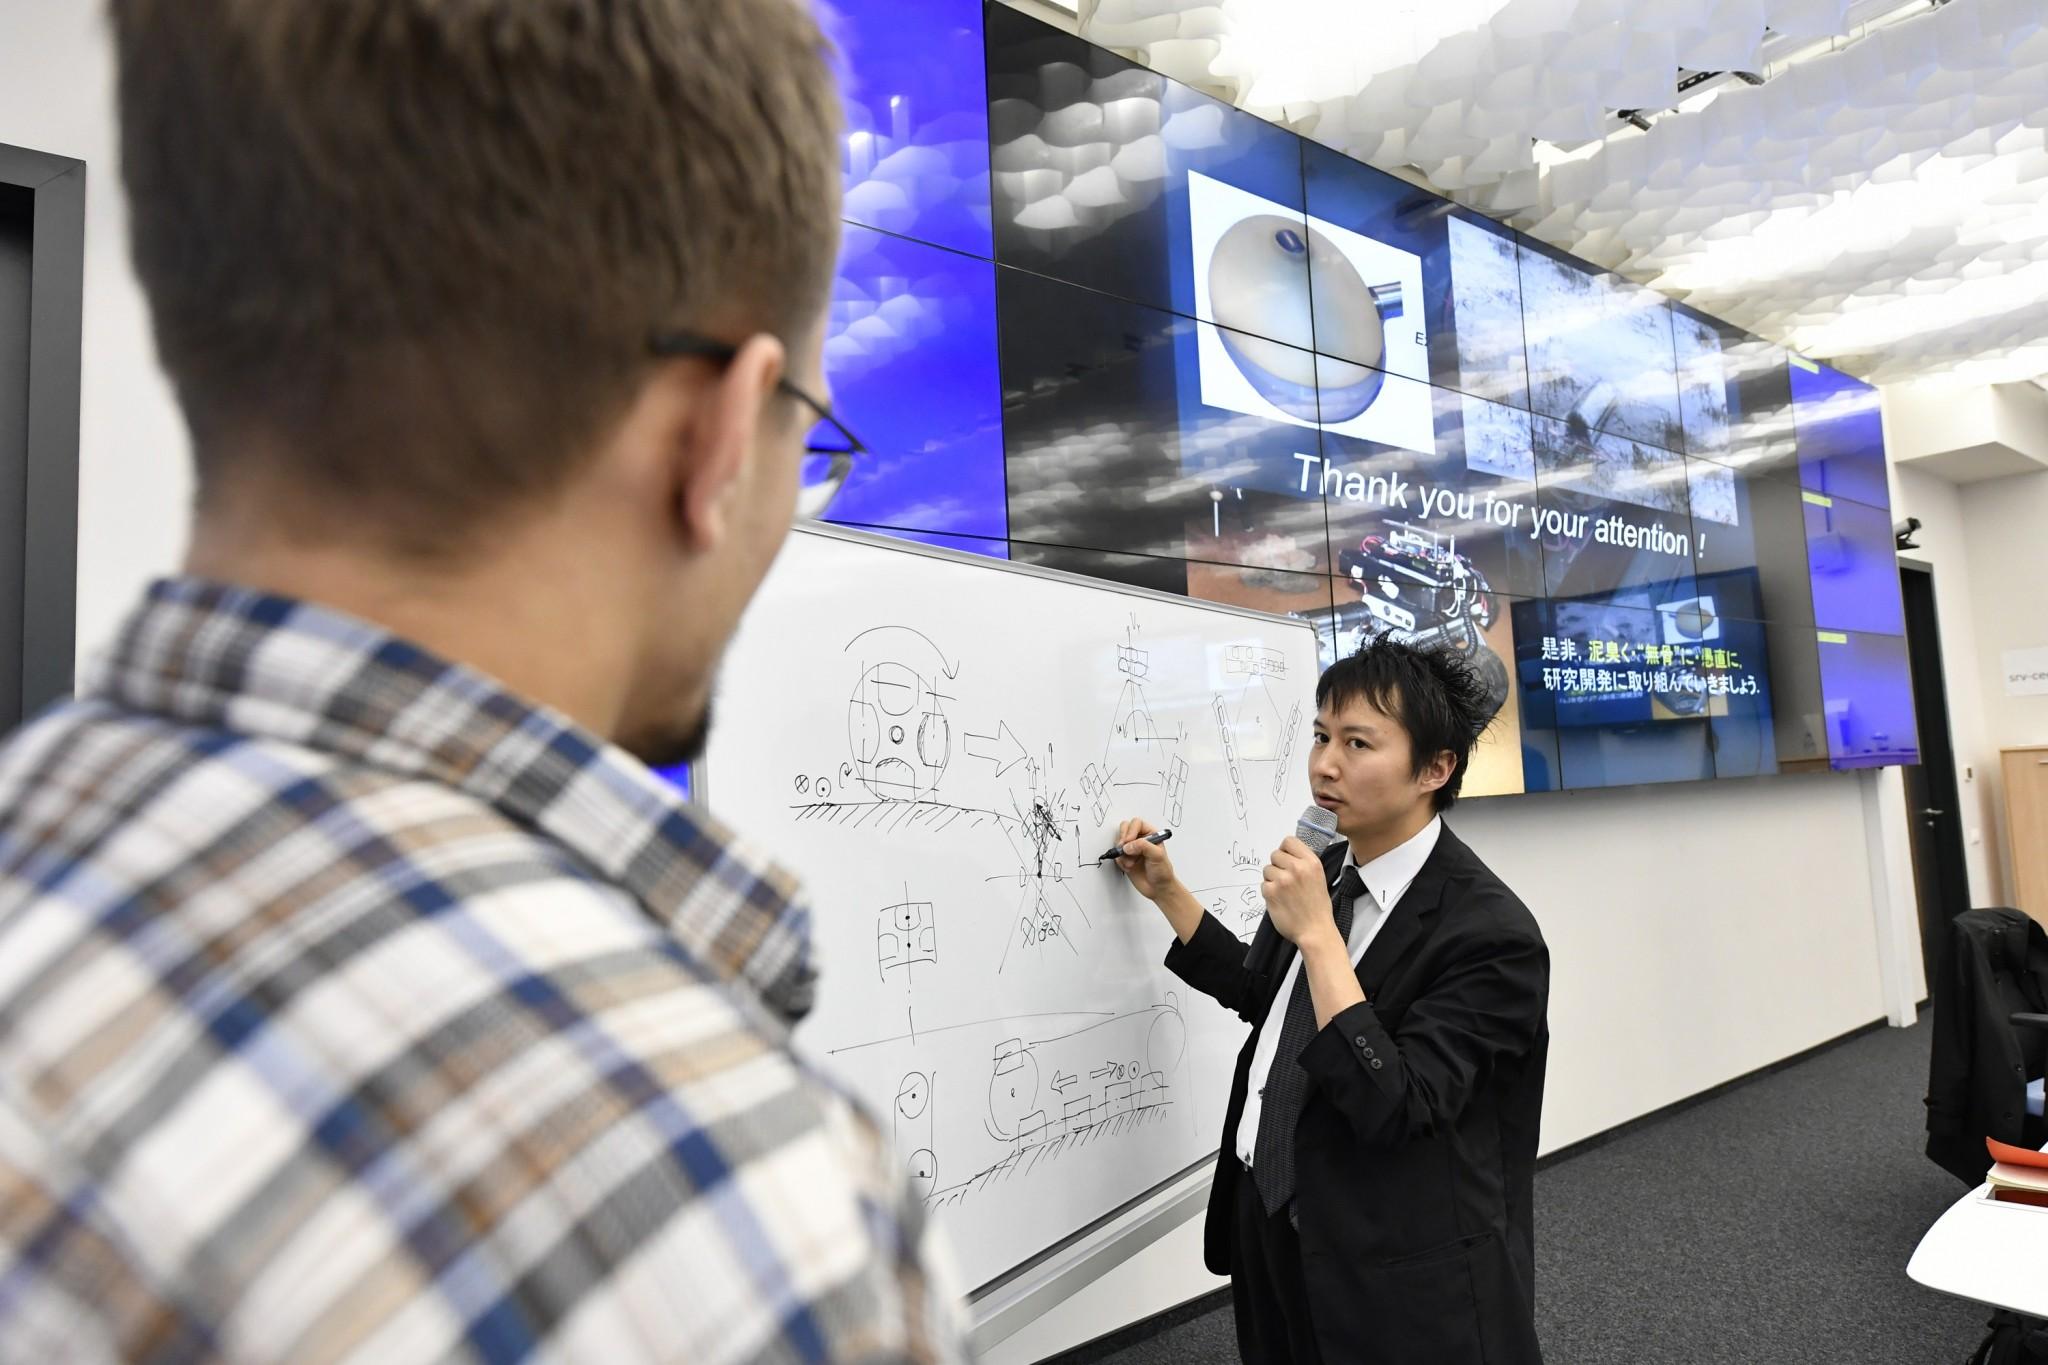 Tadakuma discusses his work with a Skoltech student. Photo: Skoltech.